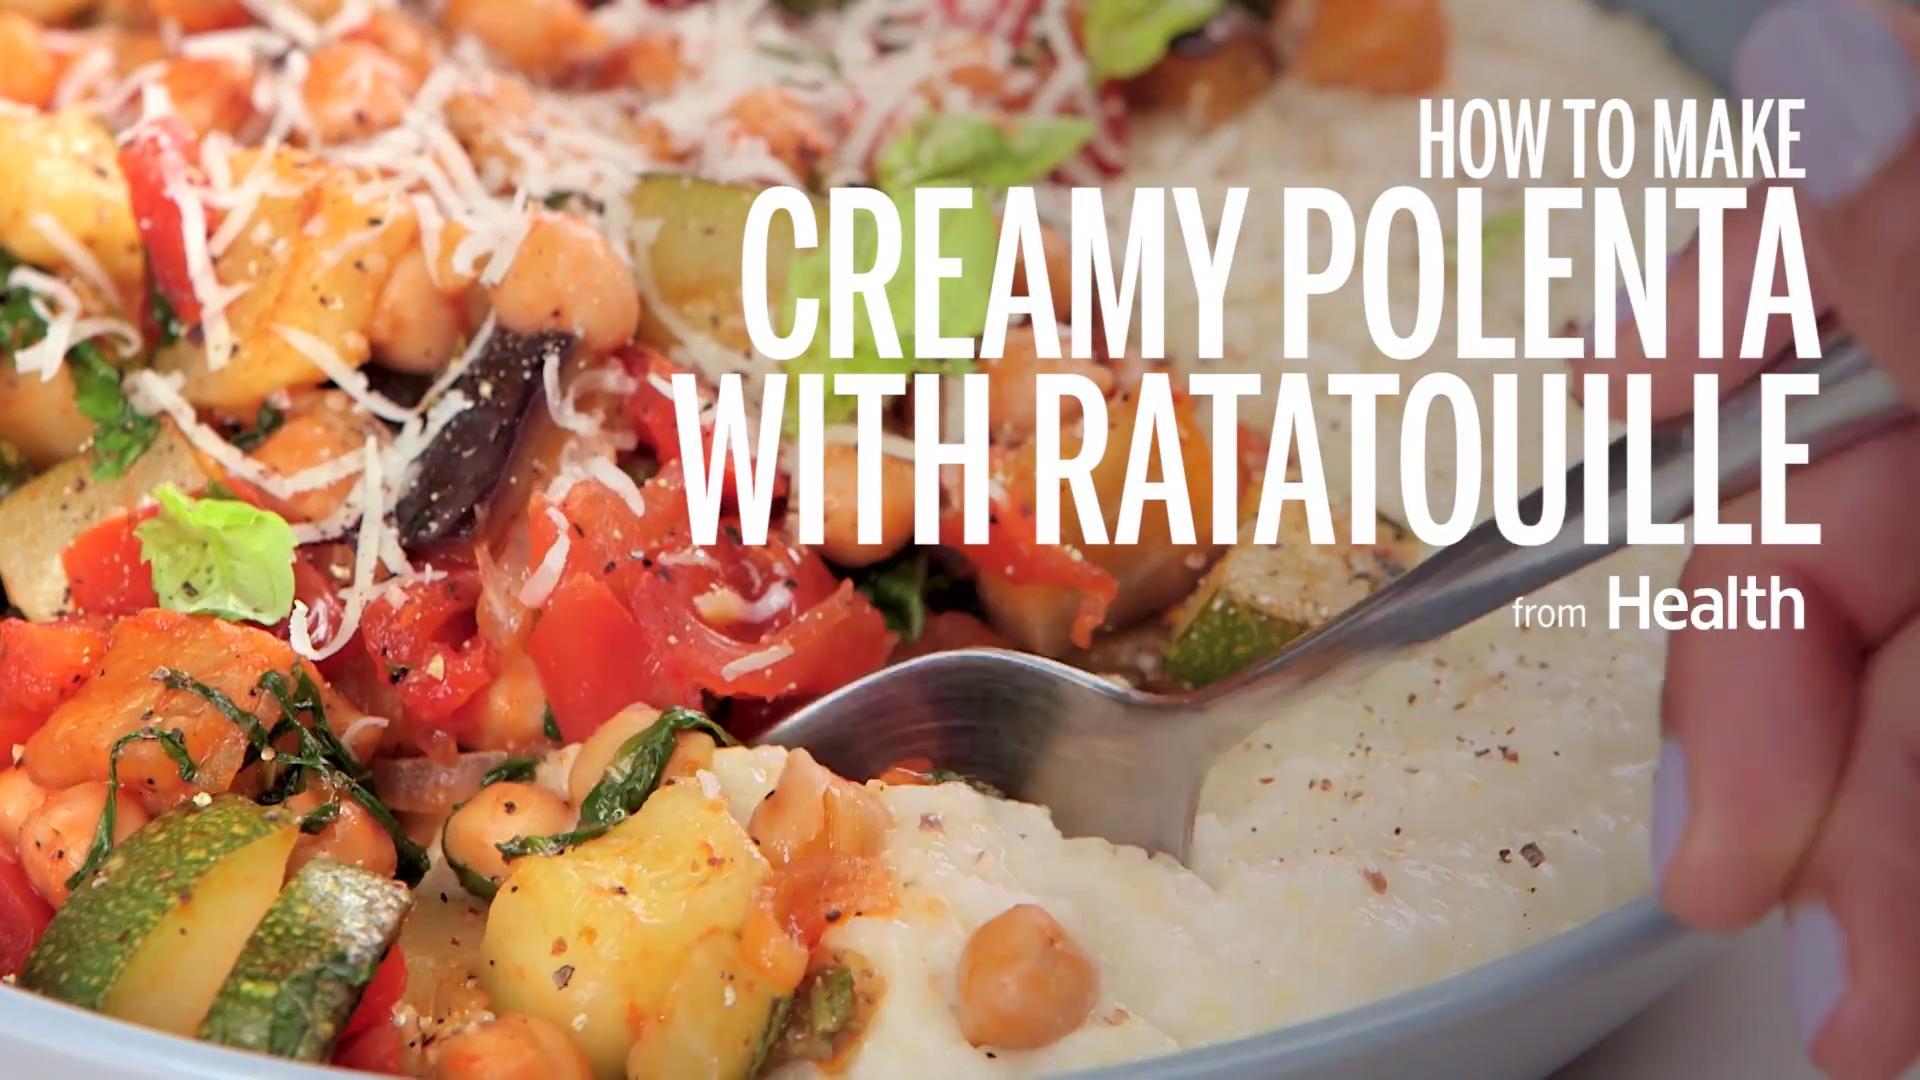 Creamy Polenta with Ratatouille